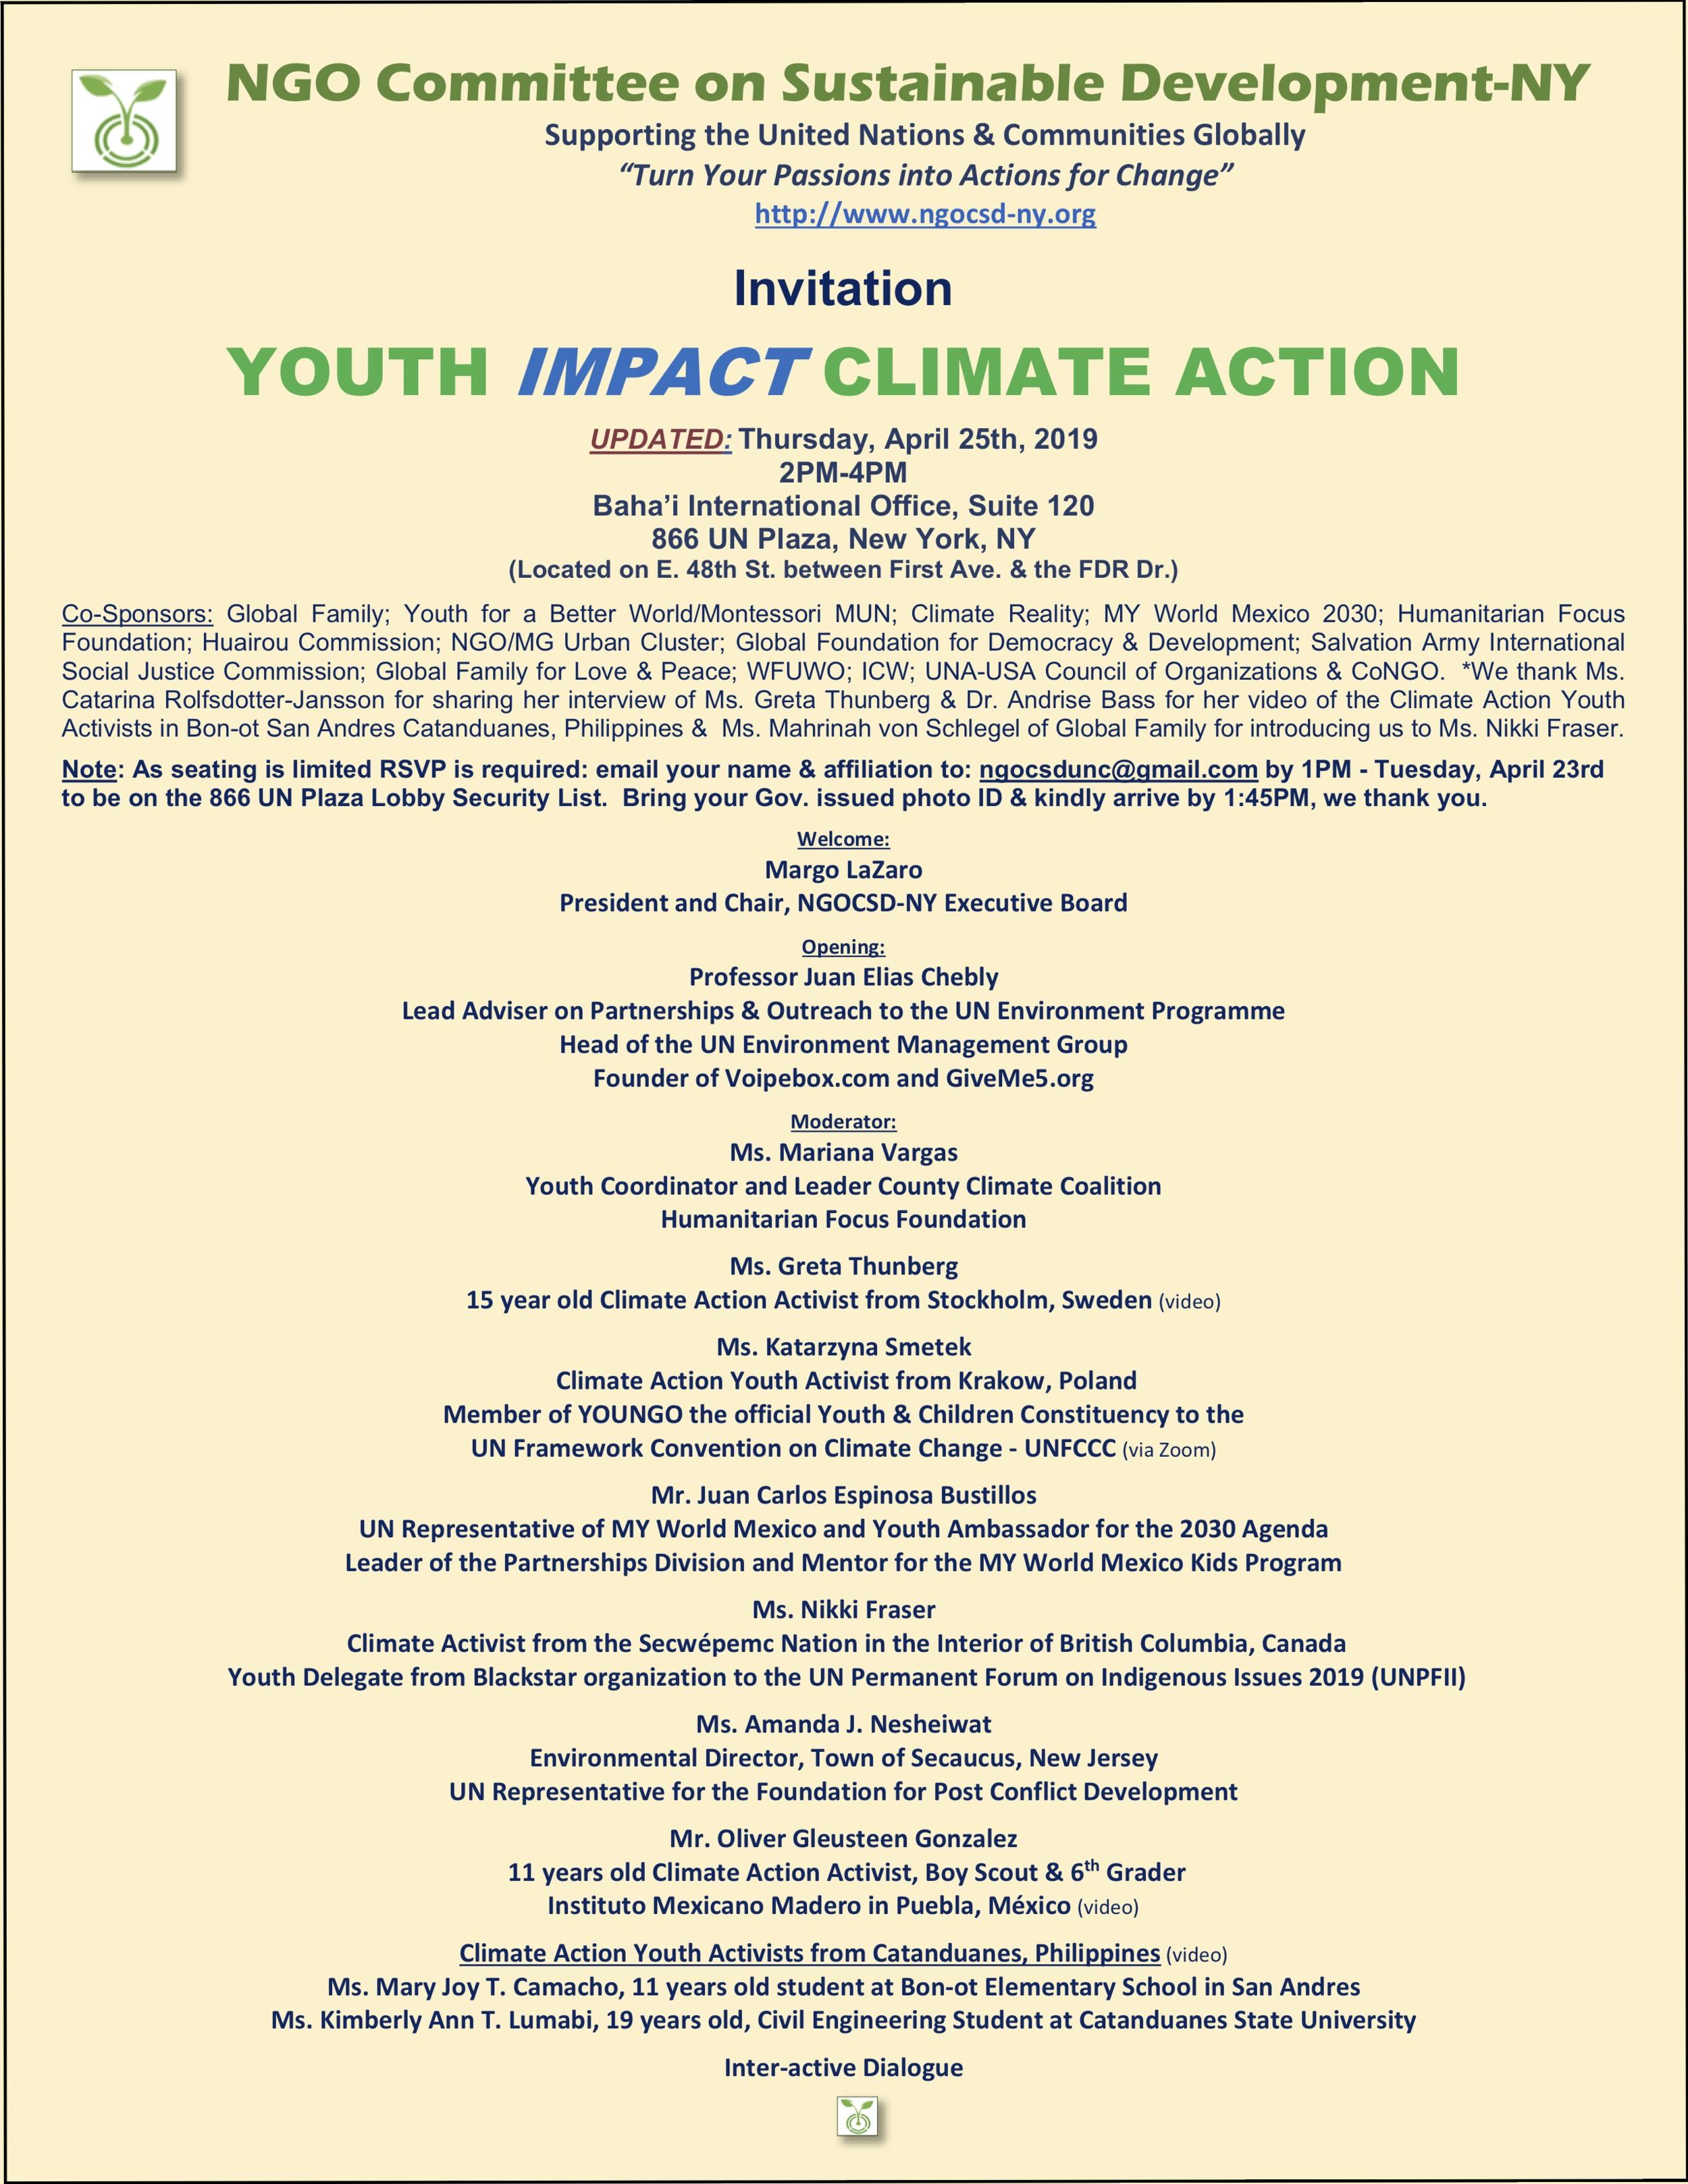 NGOsCSD-NY%2B4-25-19%2BUpdated%2BYouth%2BImpact%2BClimate%2BAction%2BInvitation%2BA1.jpg